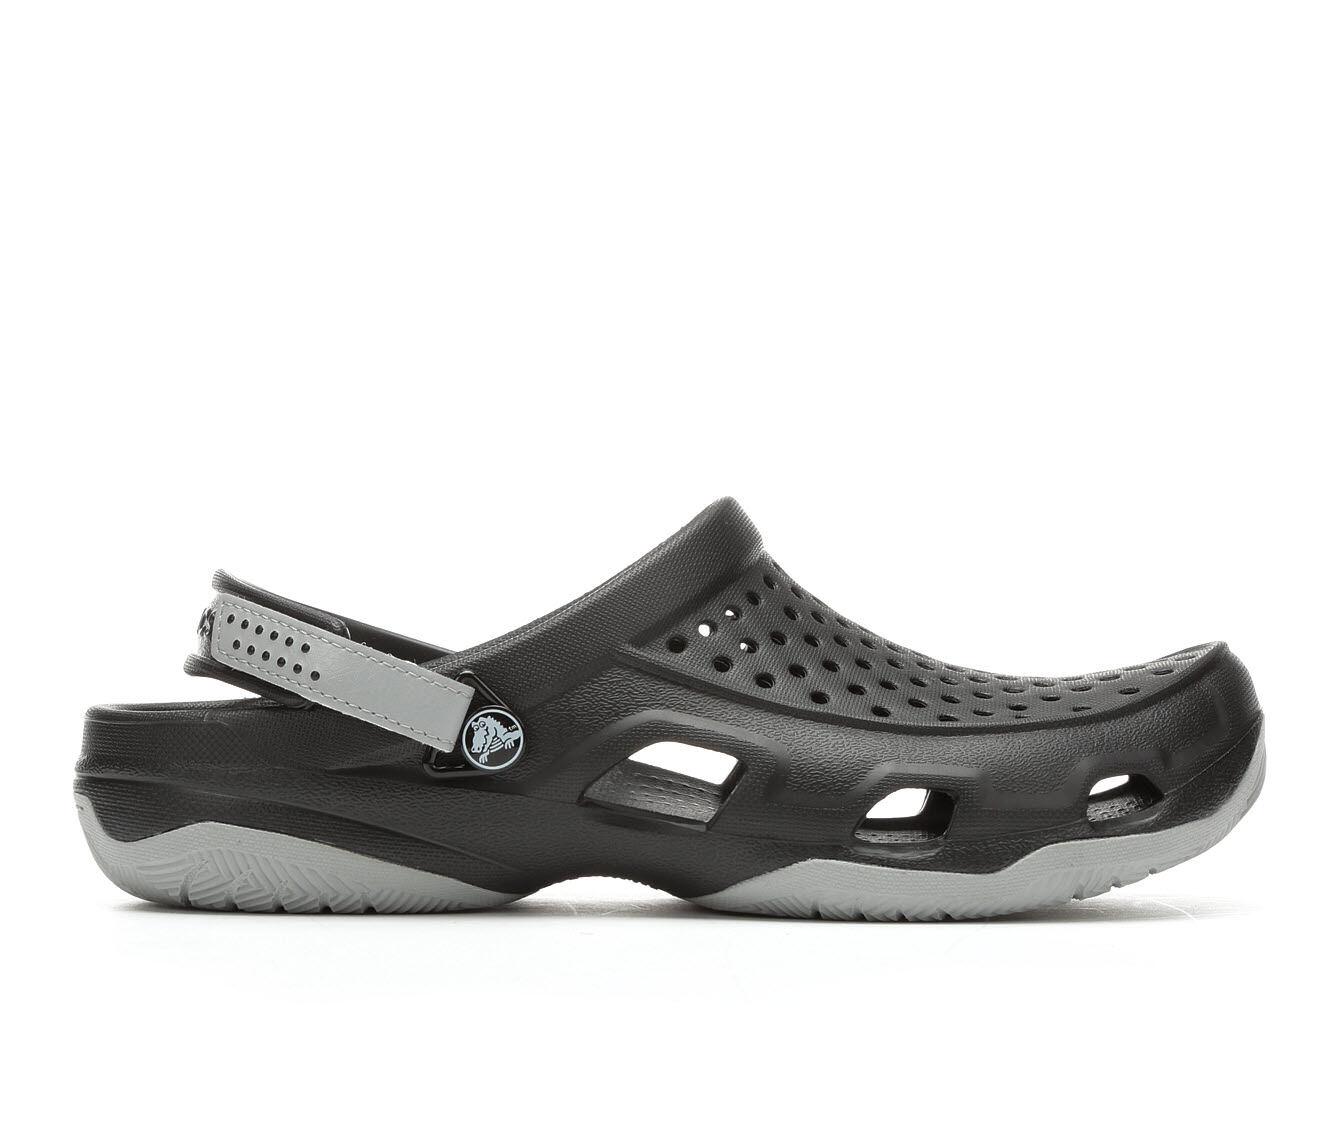 clearance Men's Crocs Swiftwater Deck Clog Black/Grey